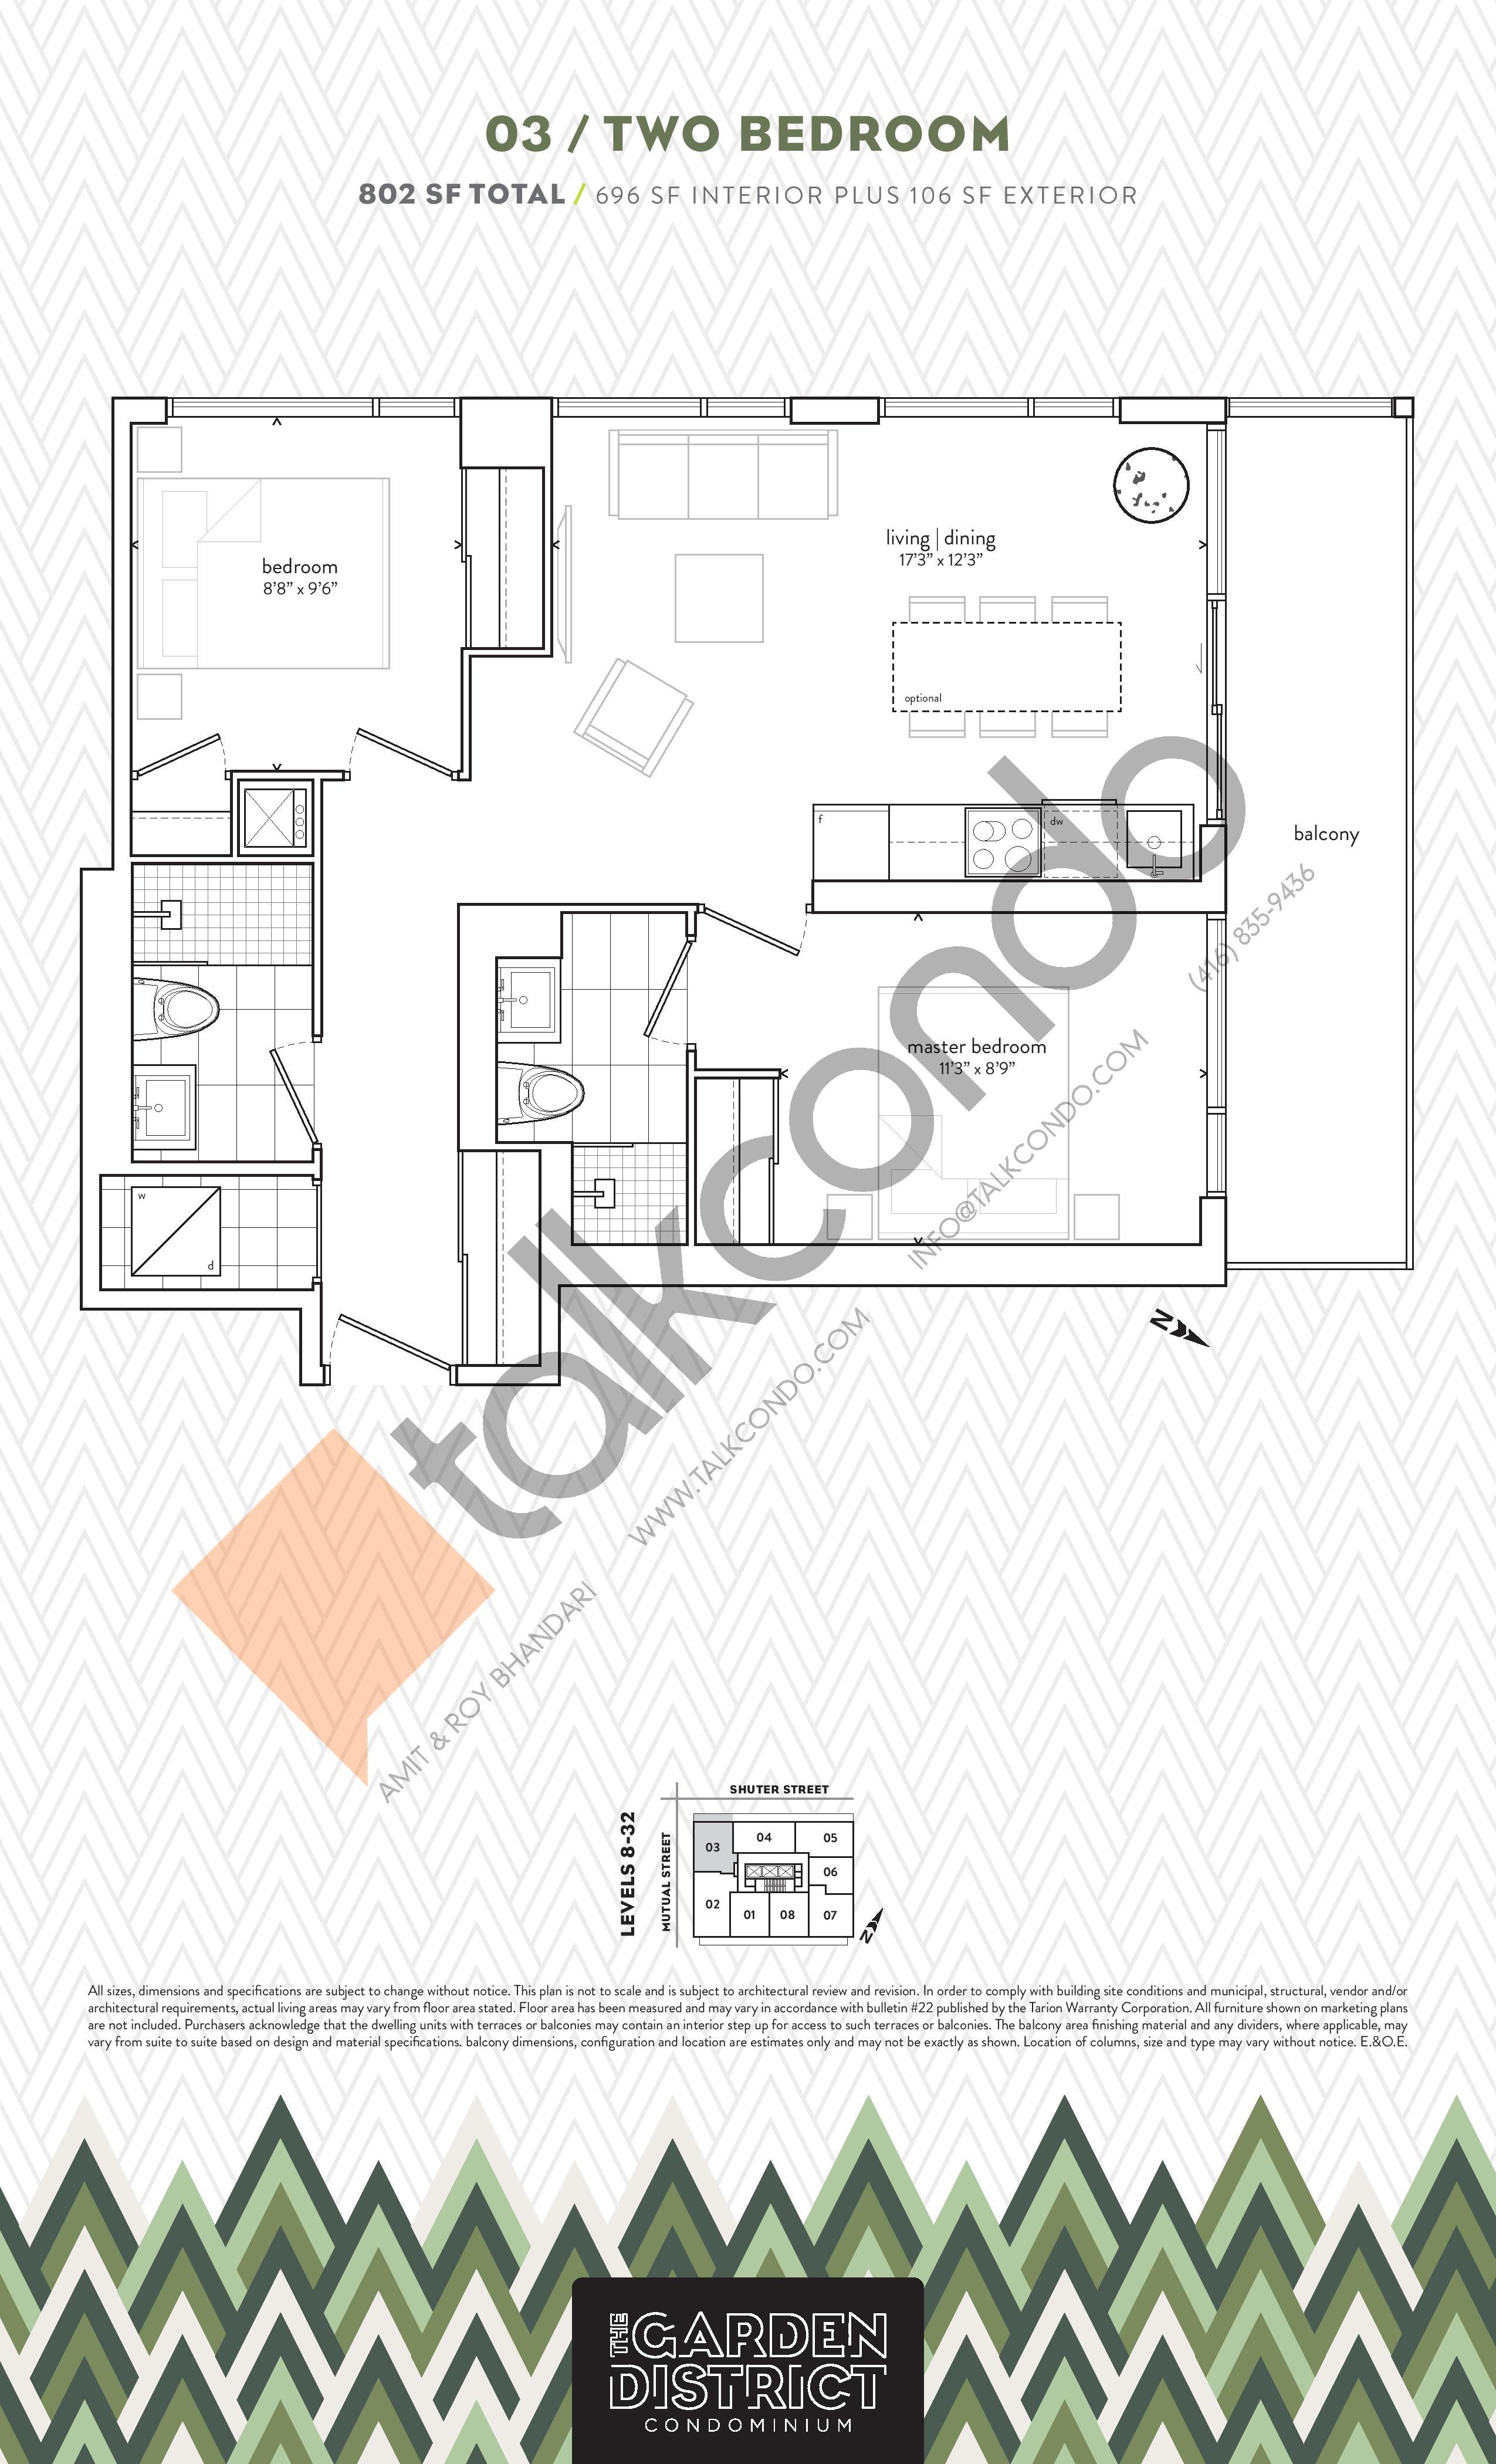 03 Floor Plan at Garden District Condos - 696 sq.ft